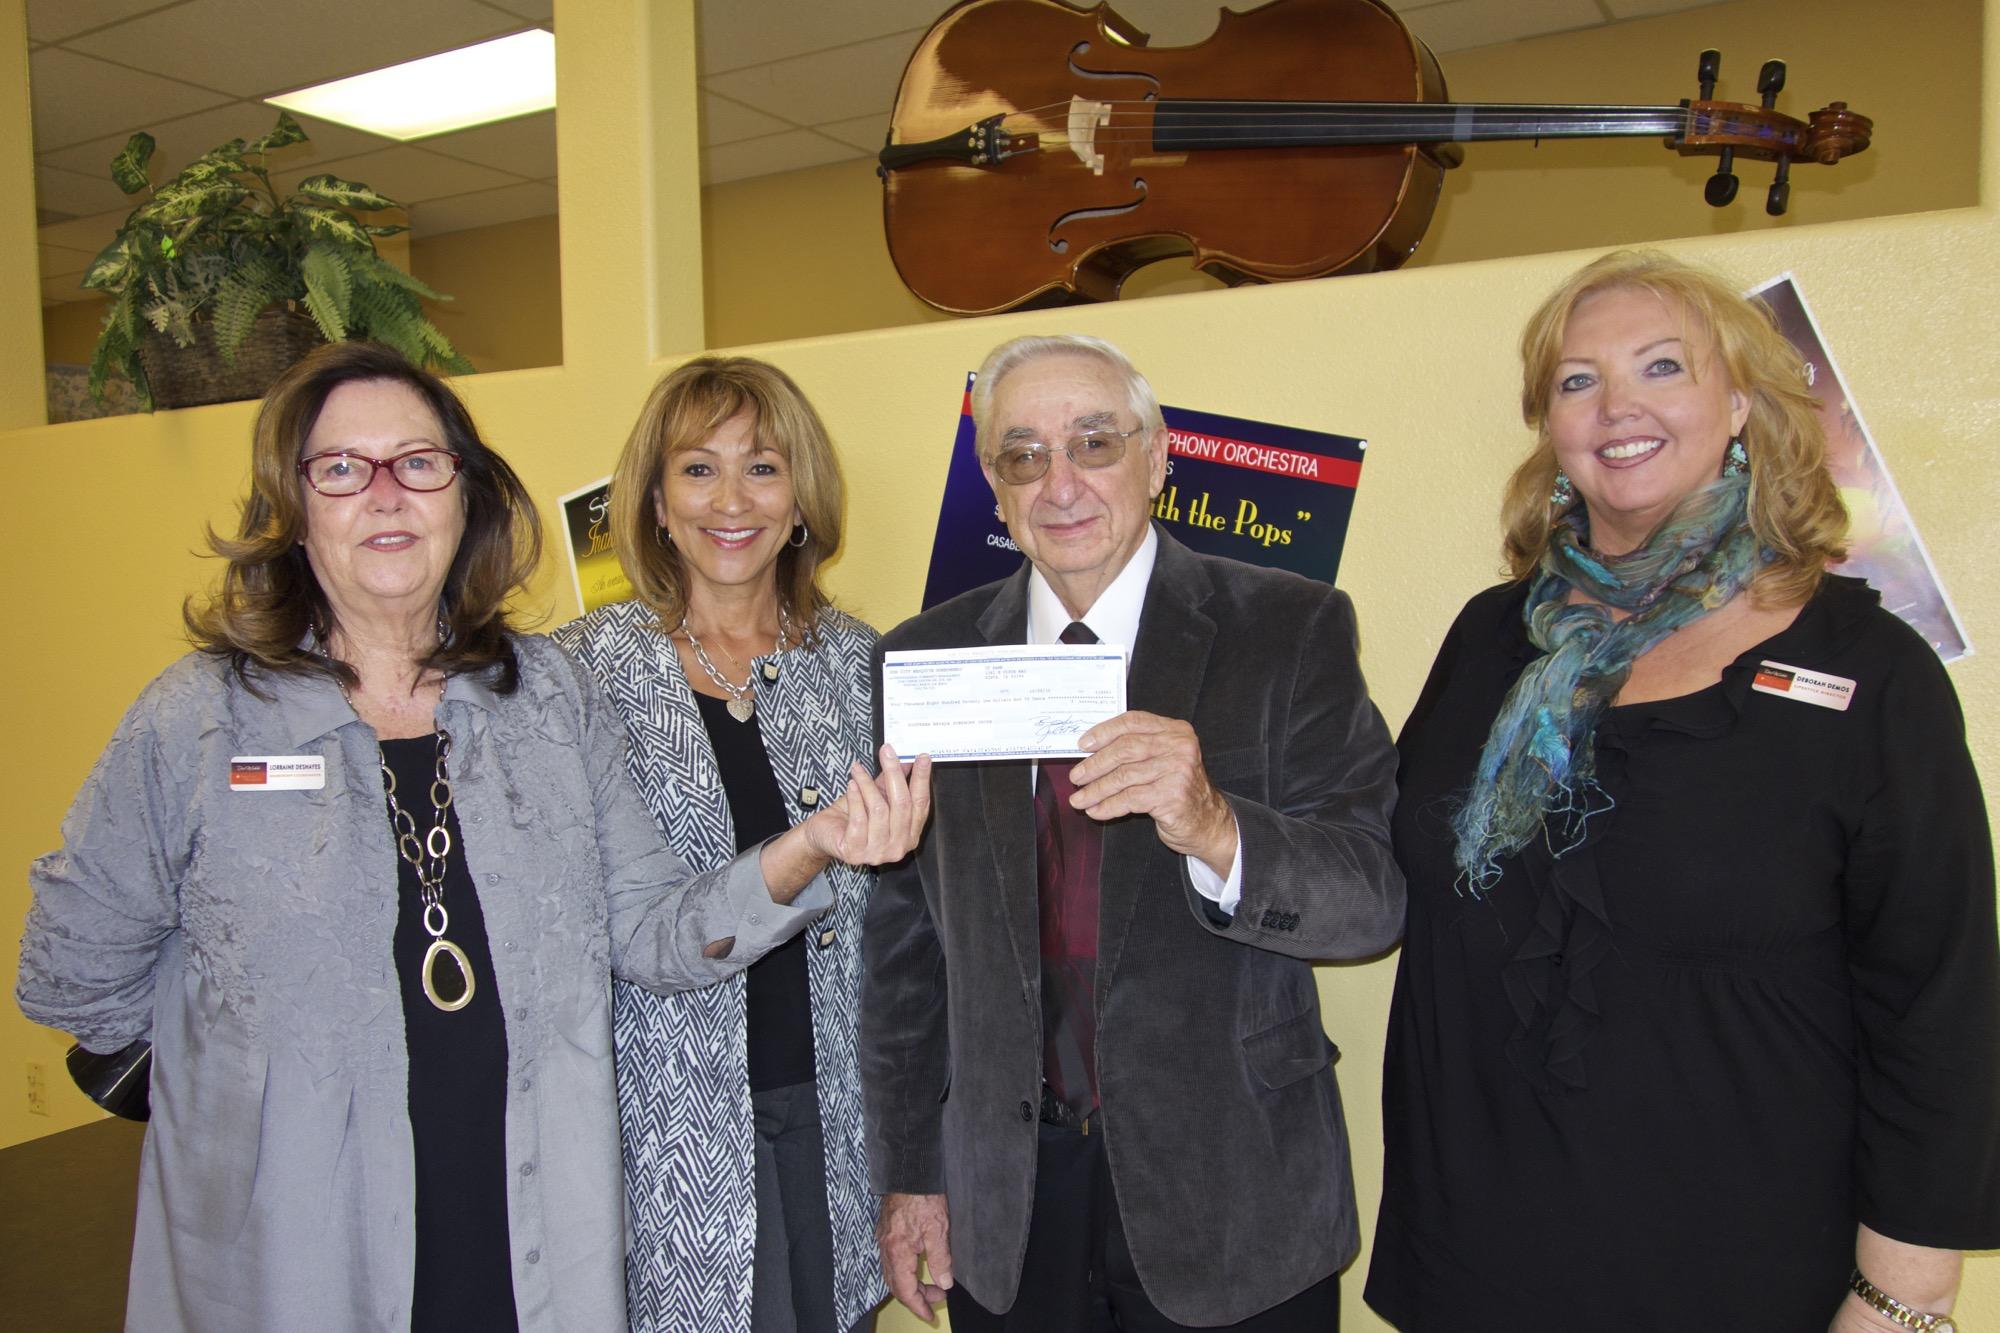 Sun City donates to Symphony Orchestra